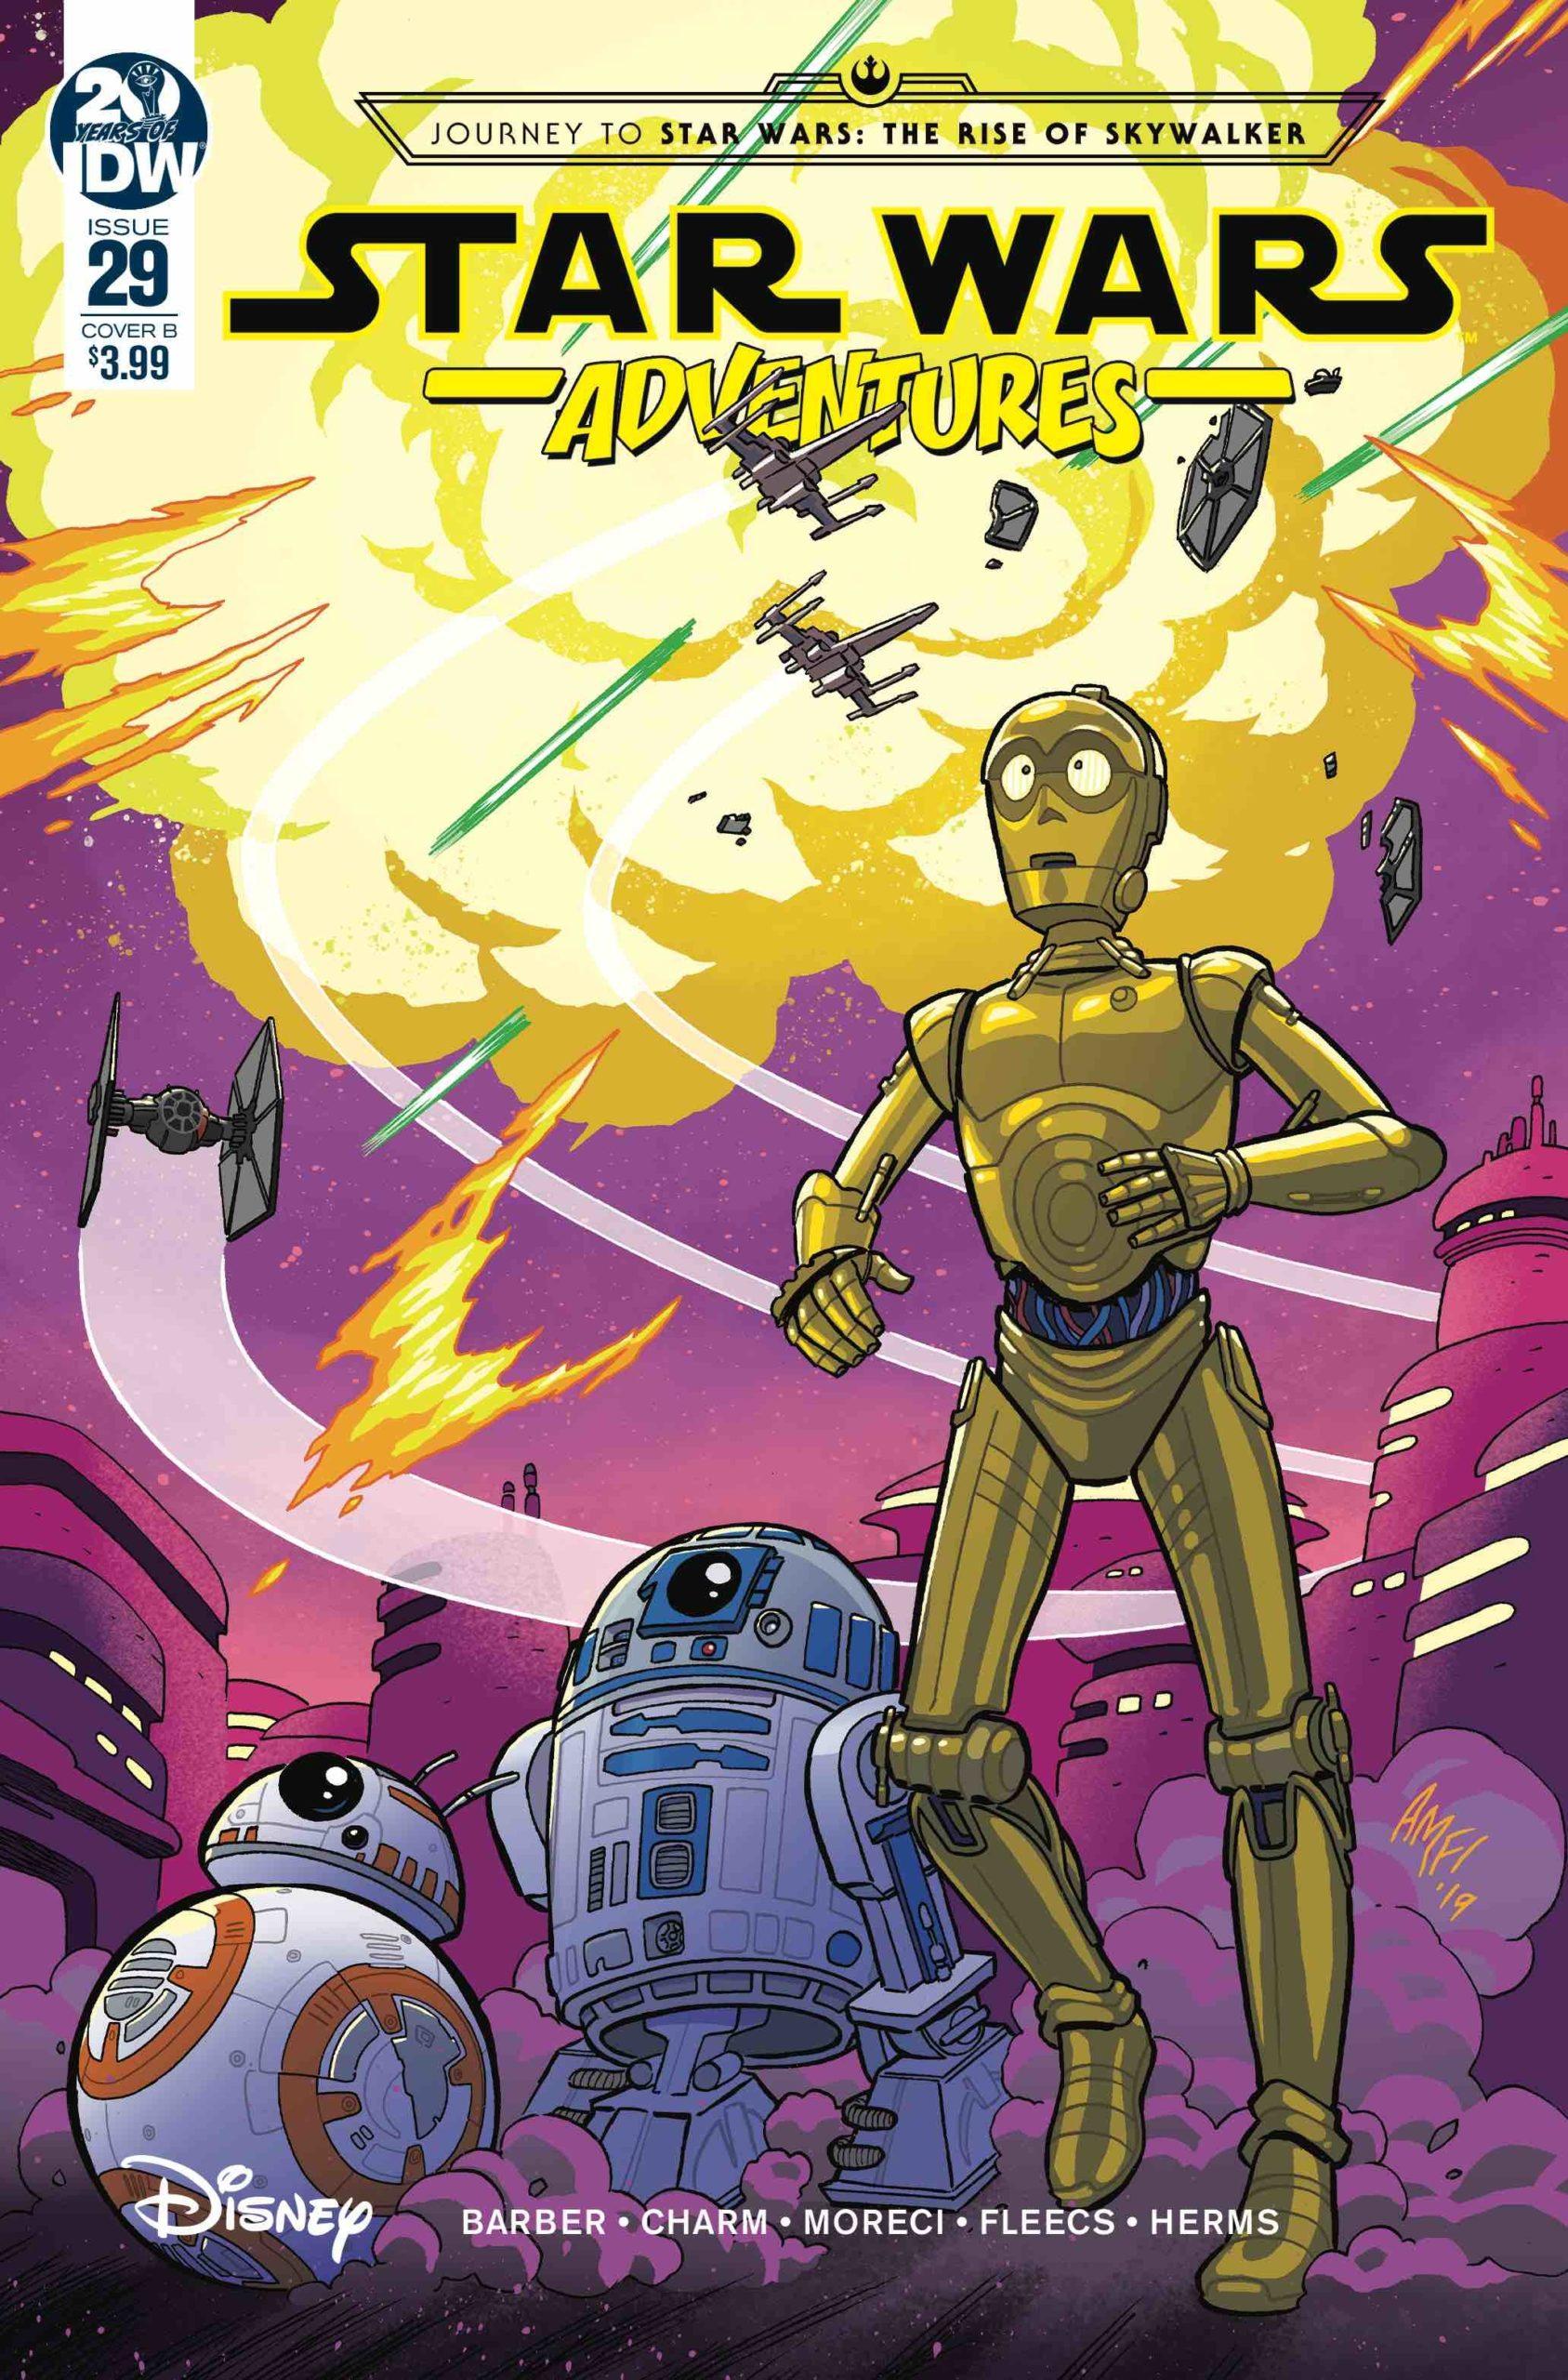 Star Wars Adventures #29 (Cover B by Tony Fleecs) (18.12.2019)